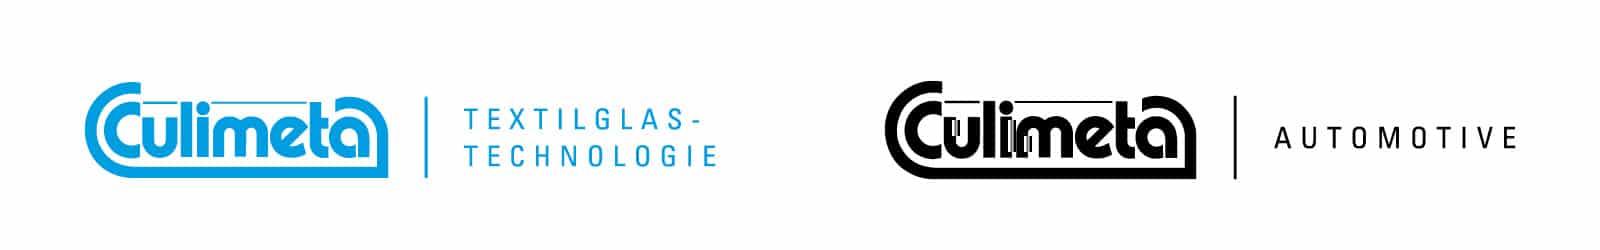 Culimeta – Unternehmensbereiche Logos